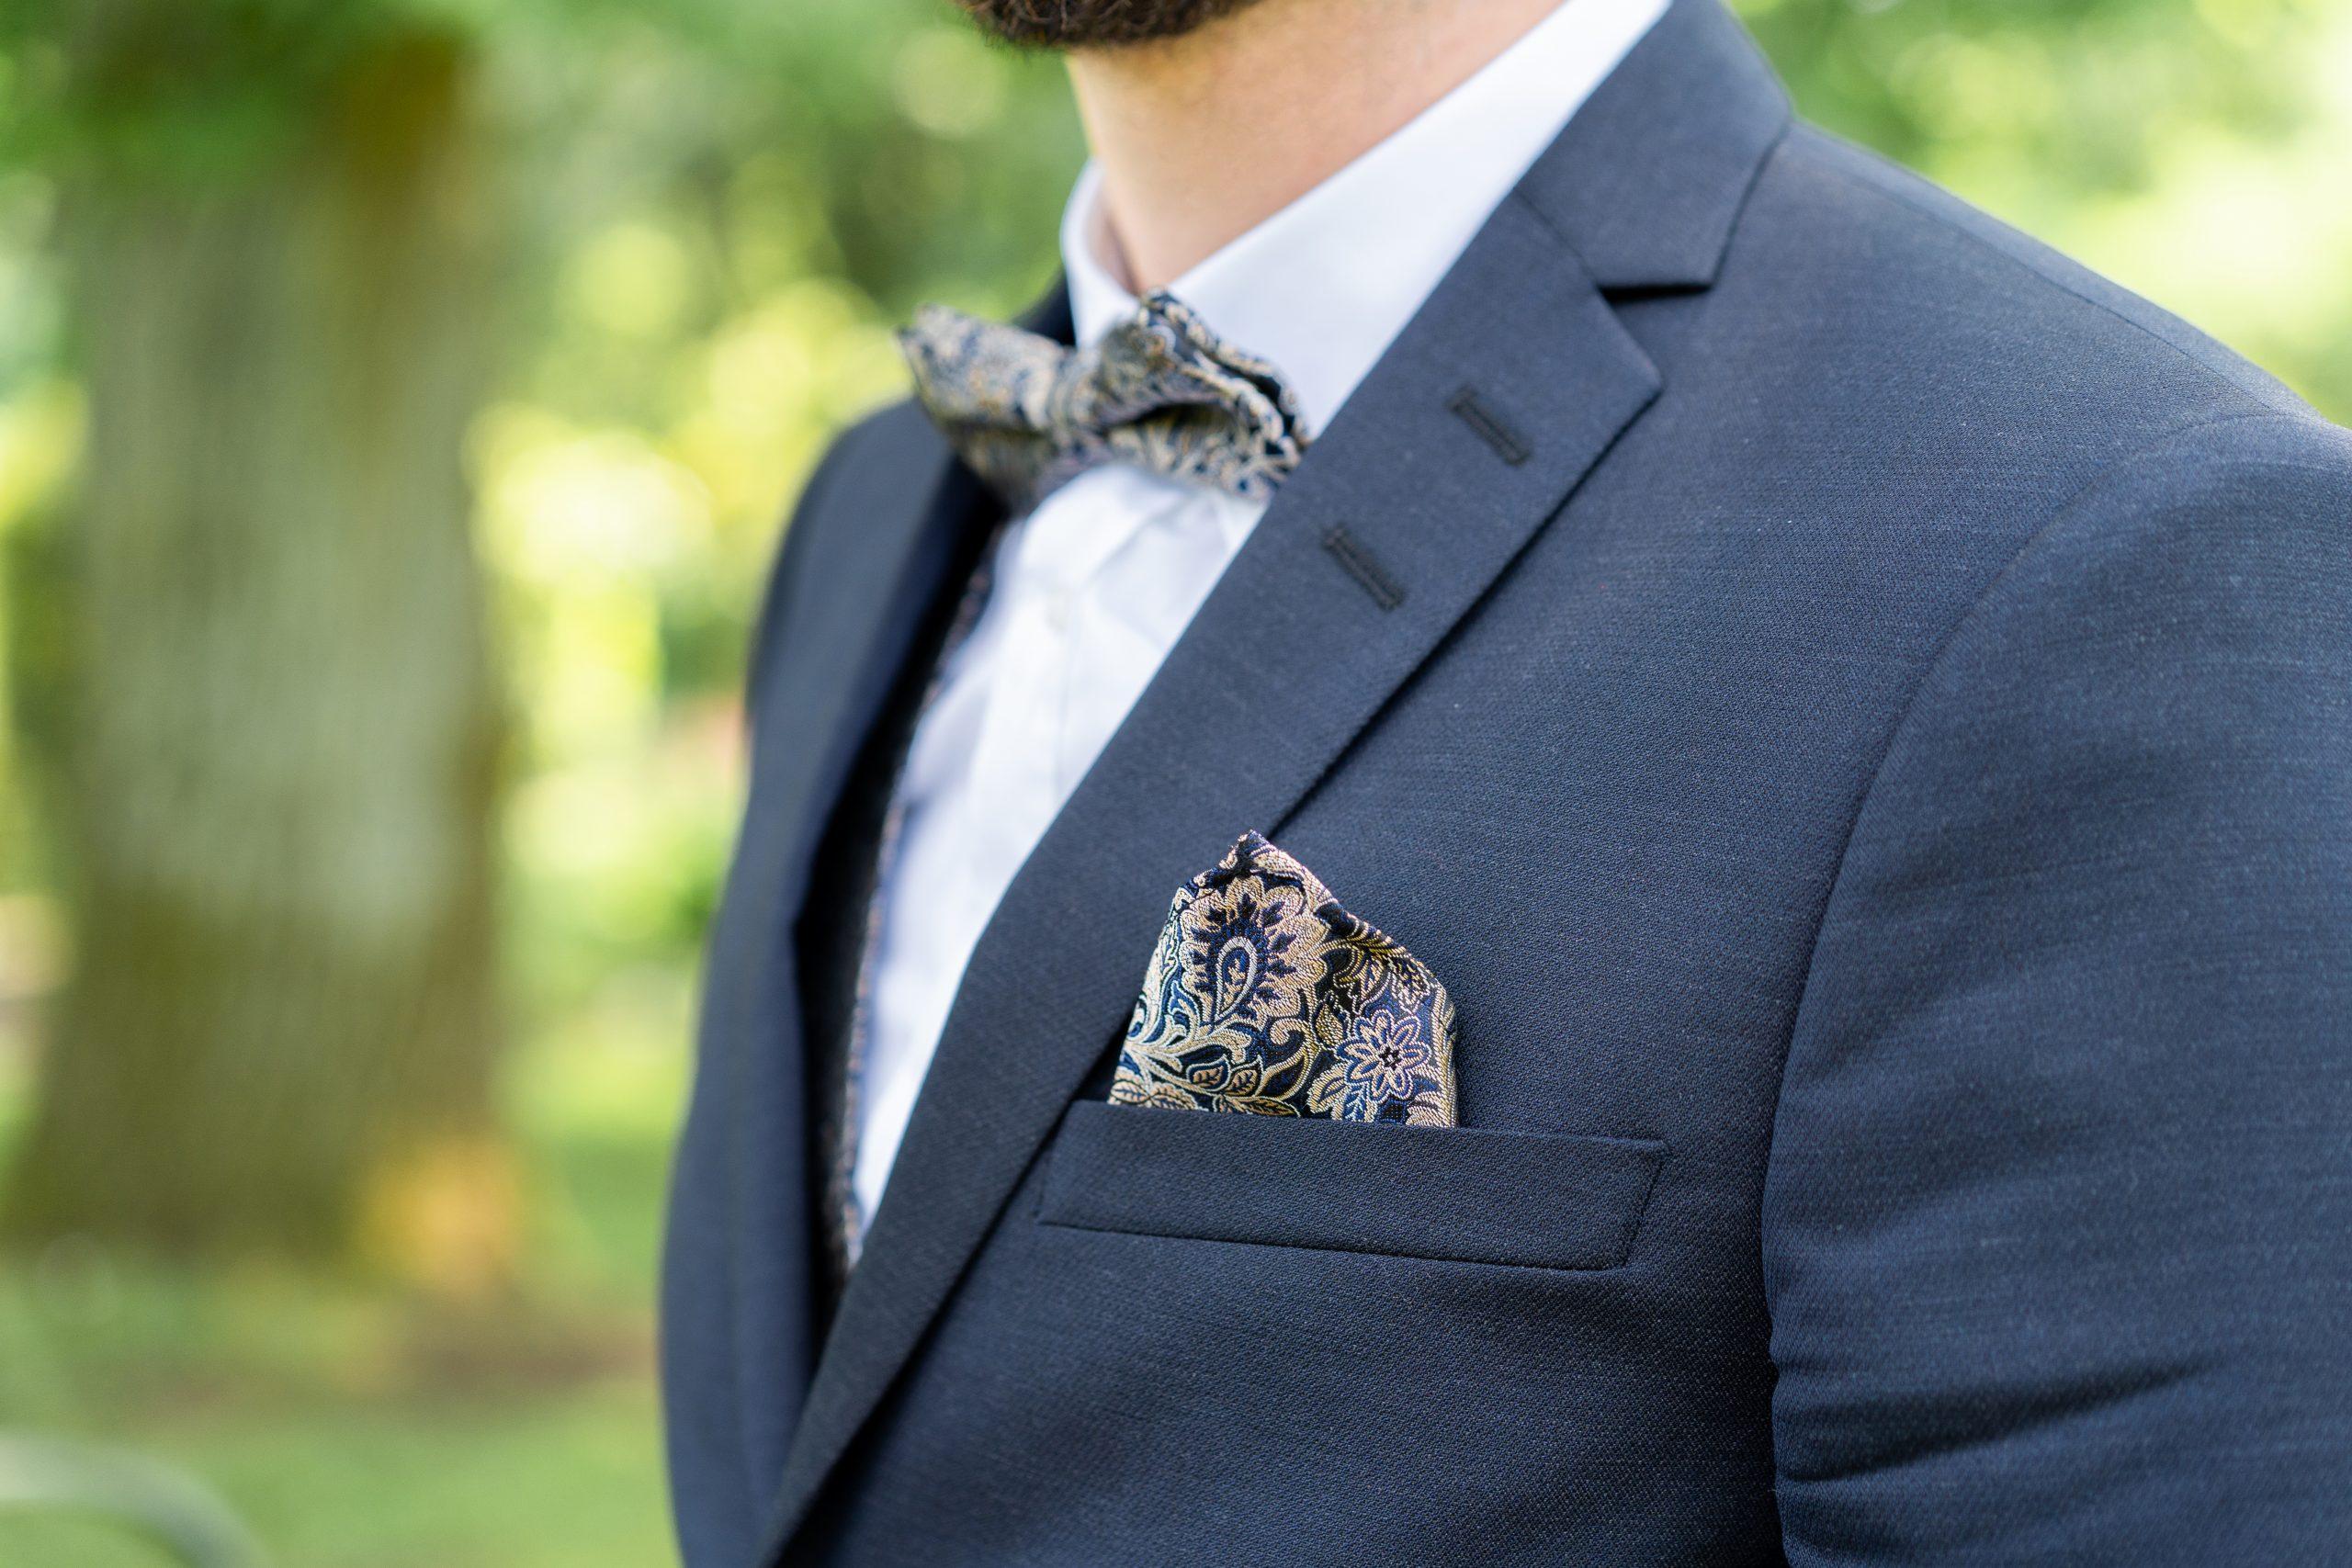 Bräutigam Mann Anzug Nahaufnahme Hochzeitsfotograf